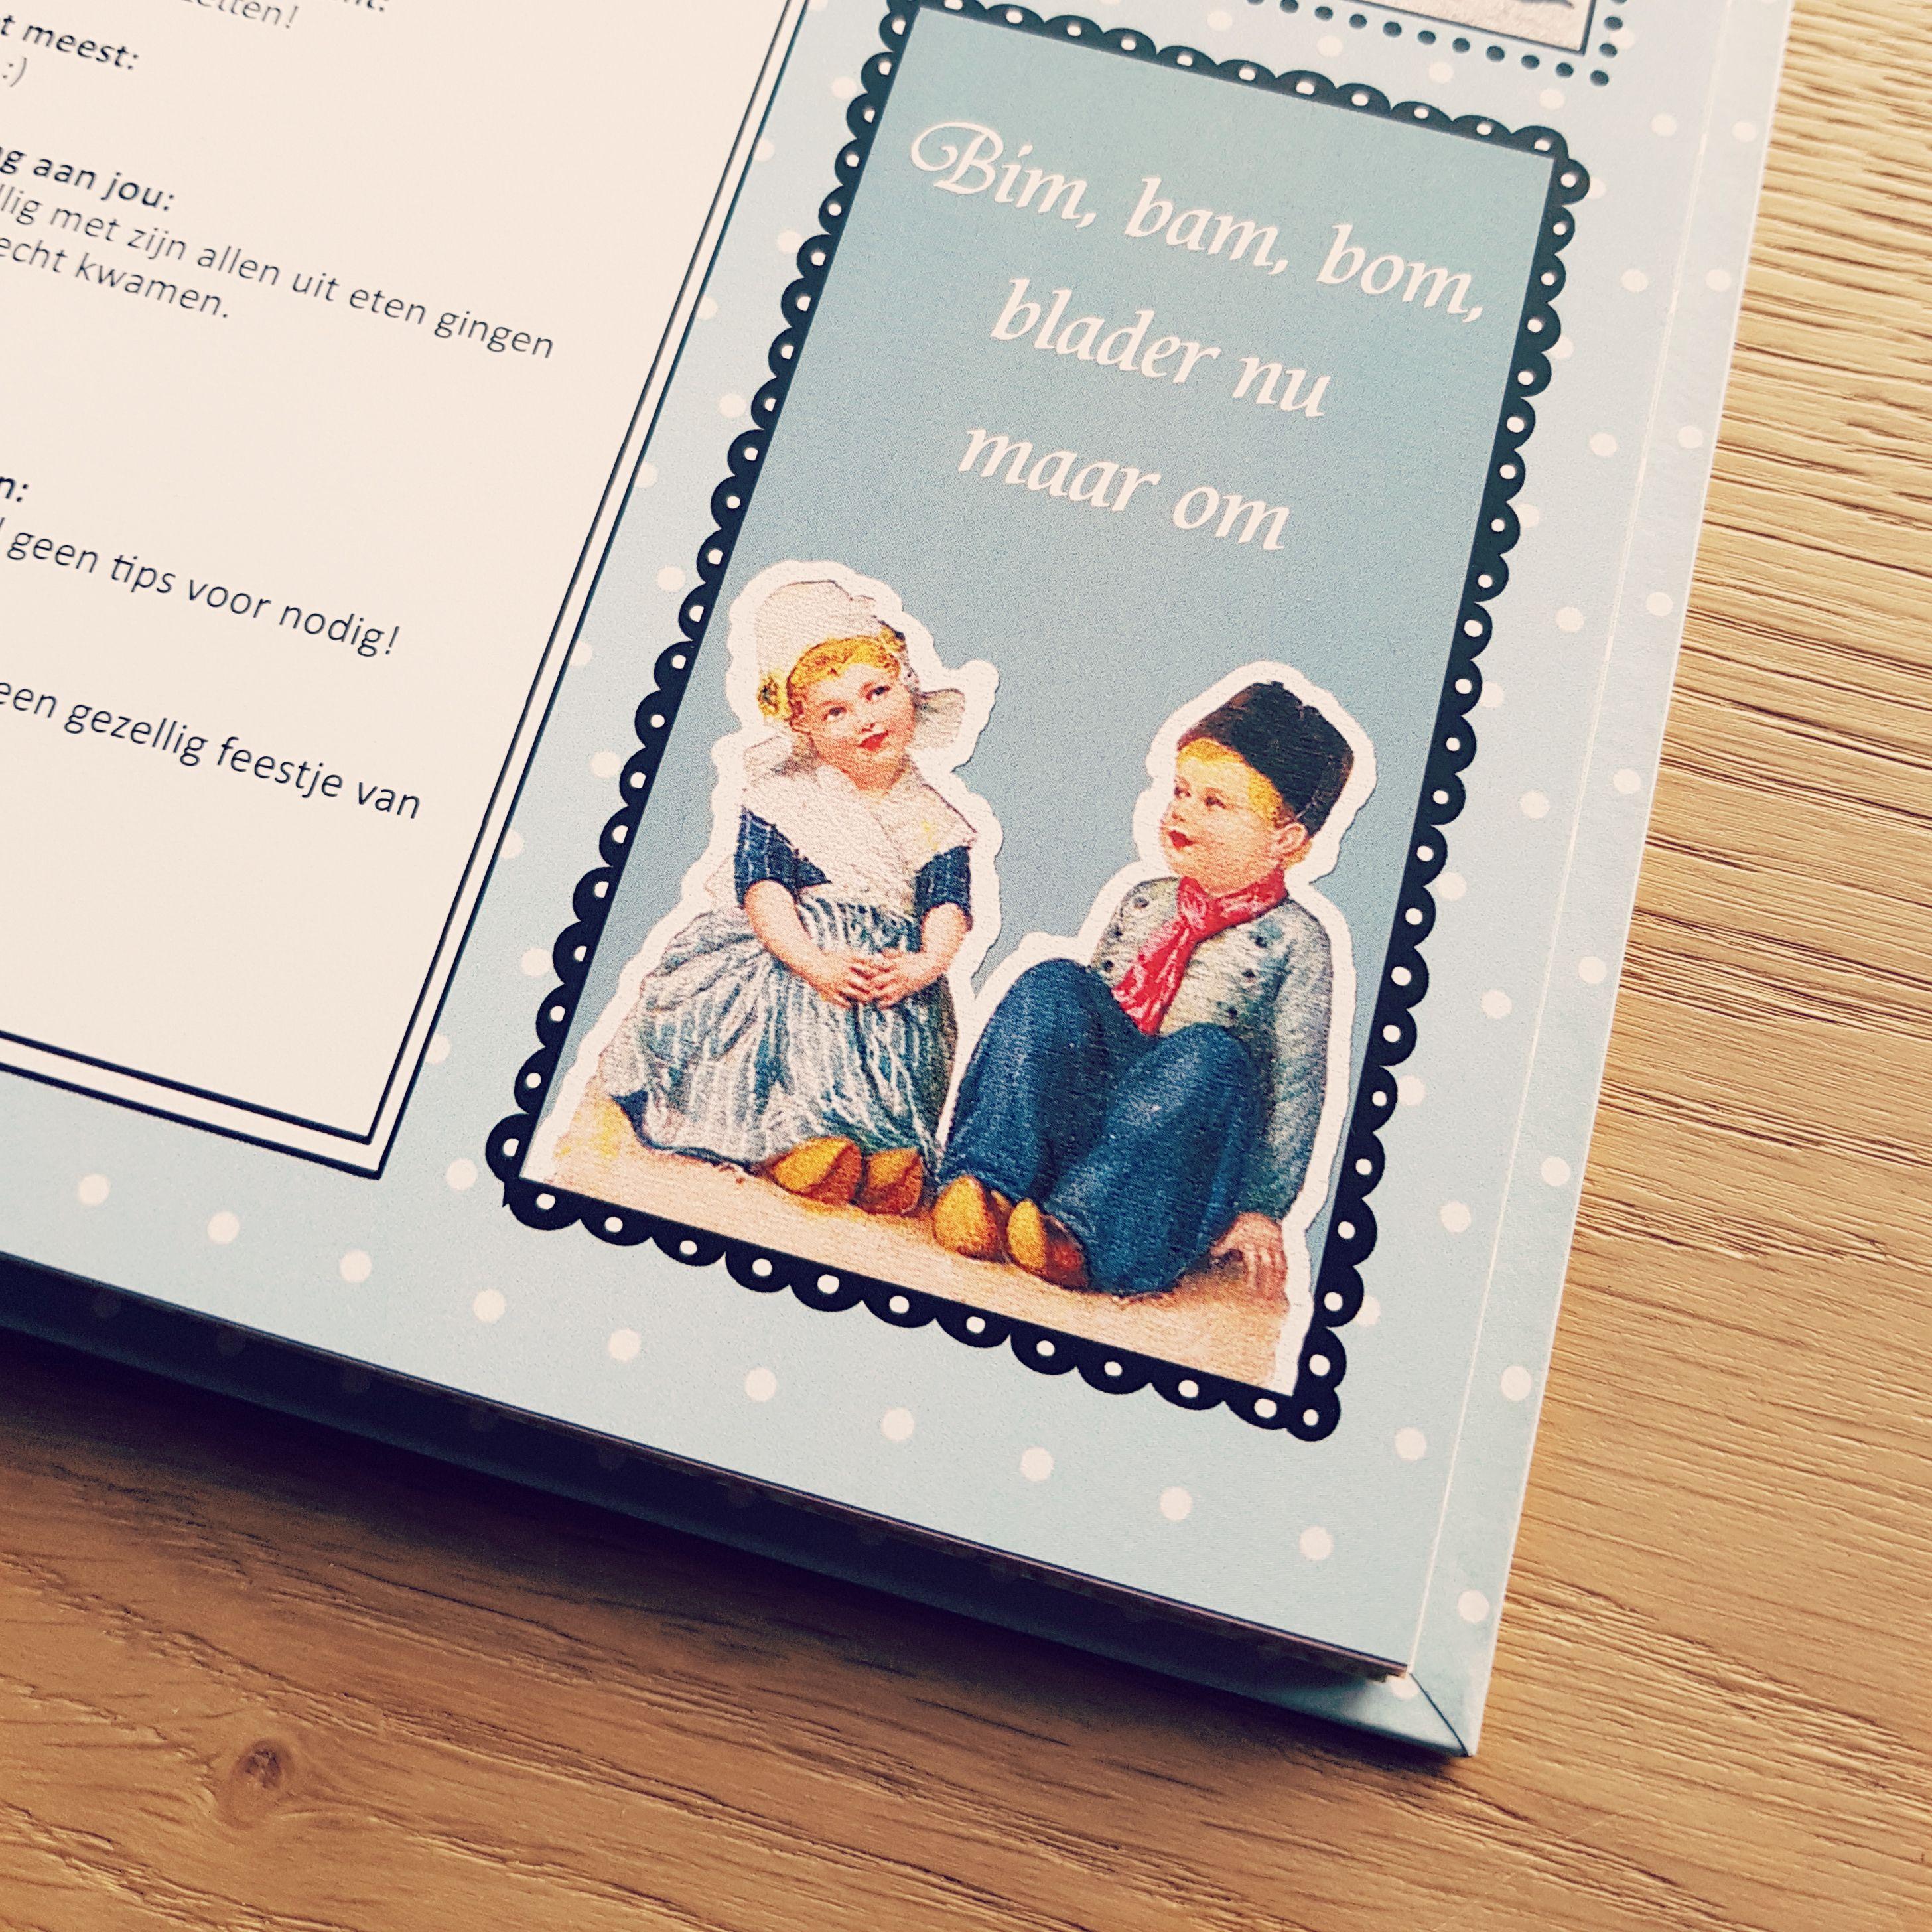 Kado Kadoidee Cadeau Cadeauidee Vriendenboek Boekdesign